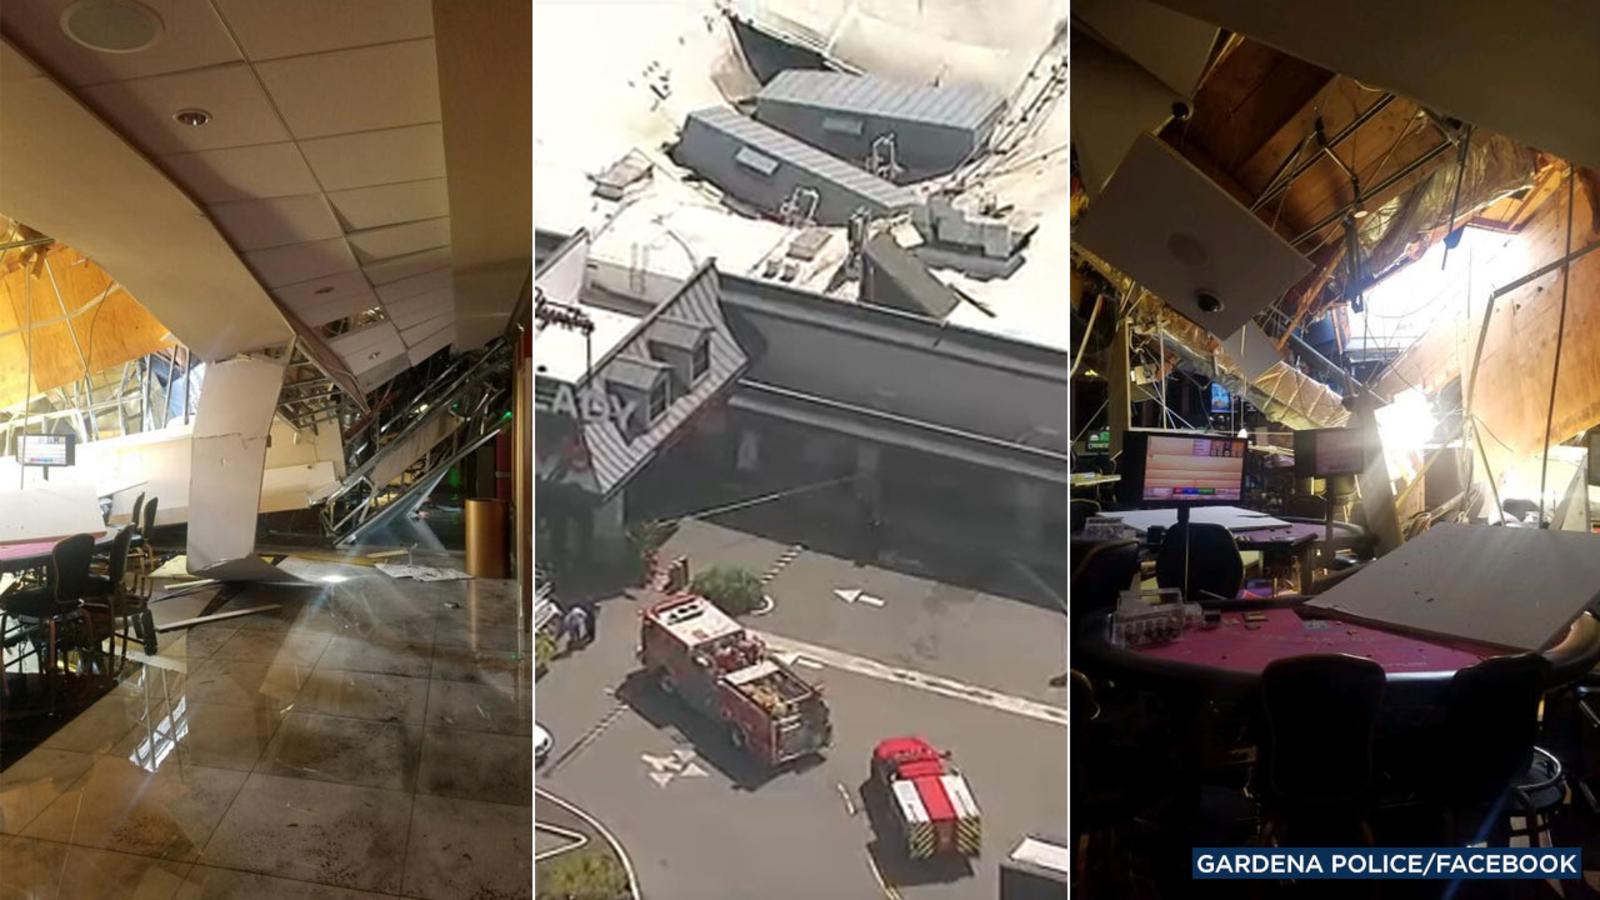 casinos in gardena california